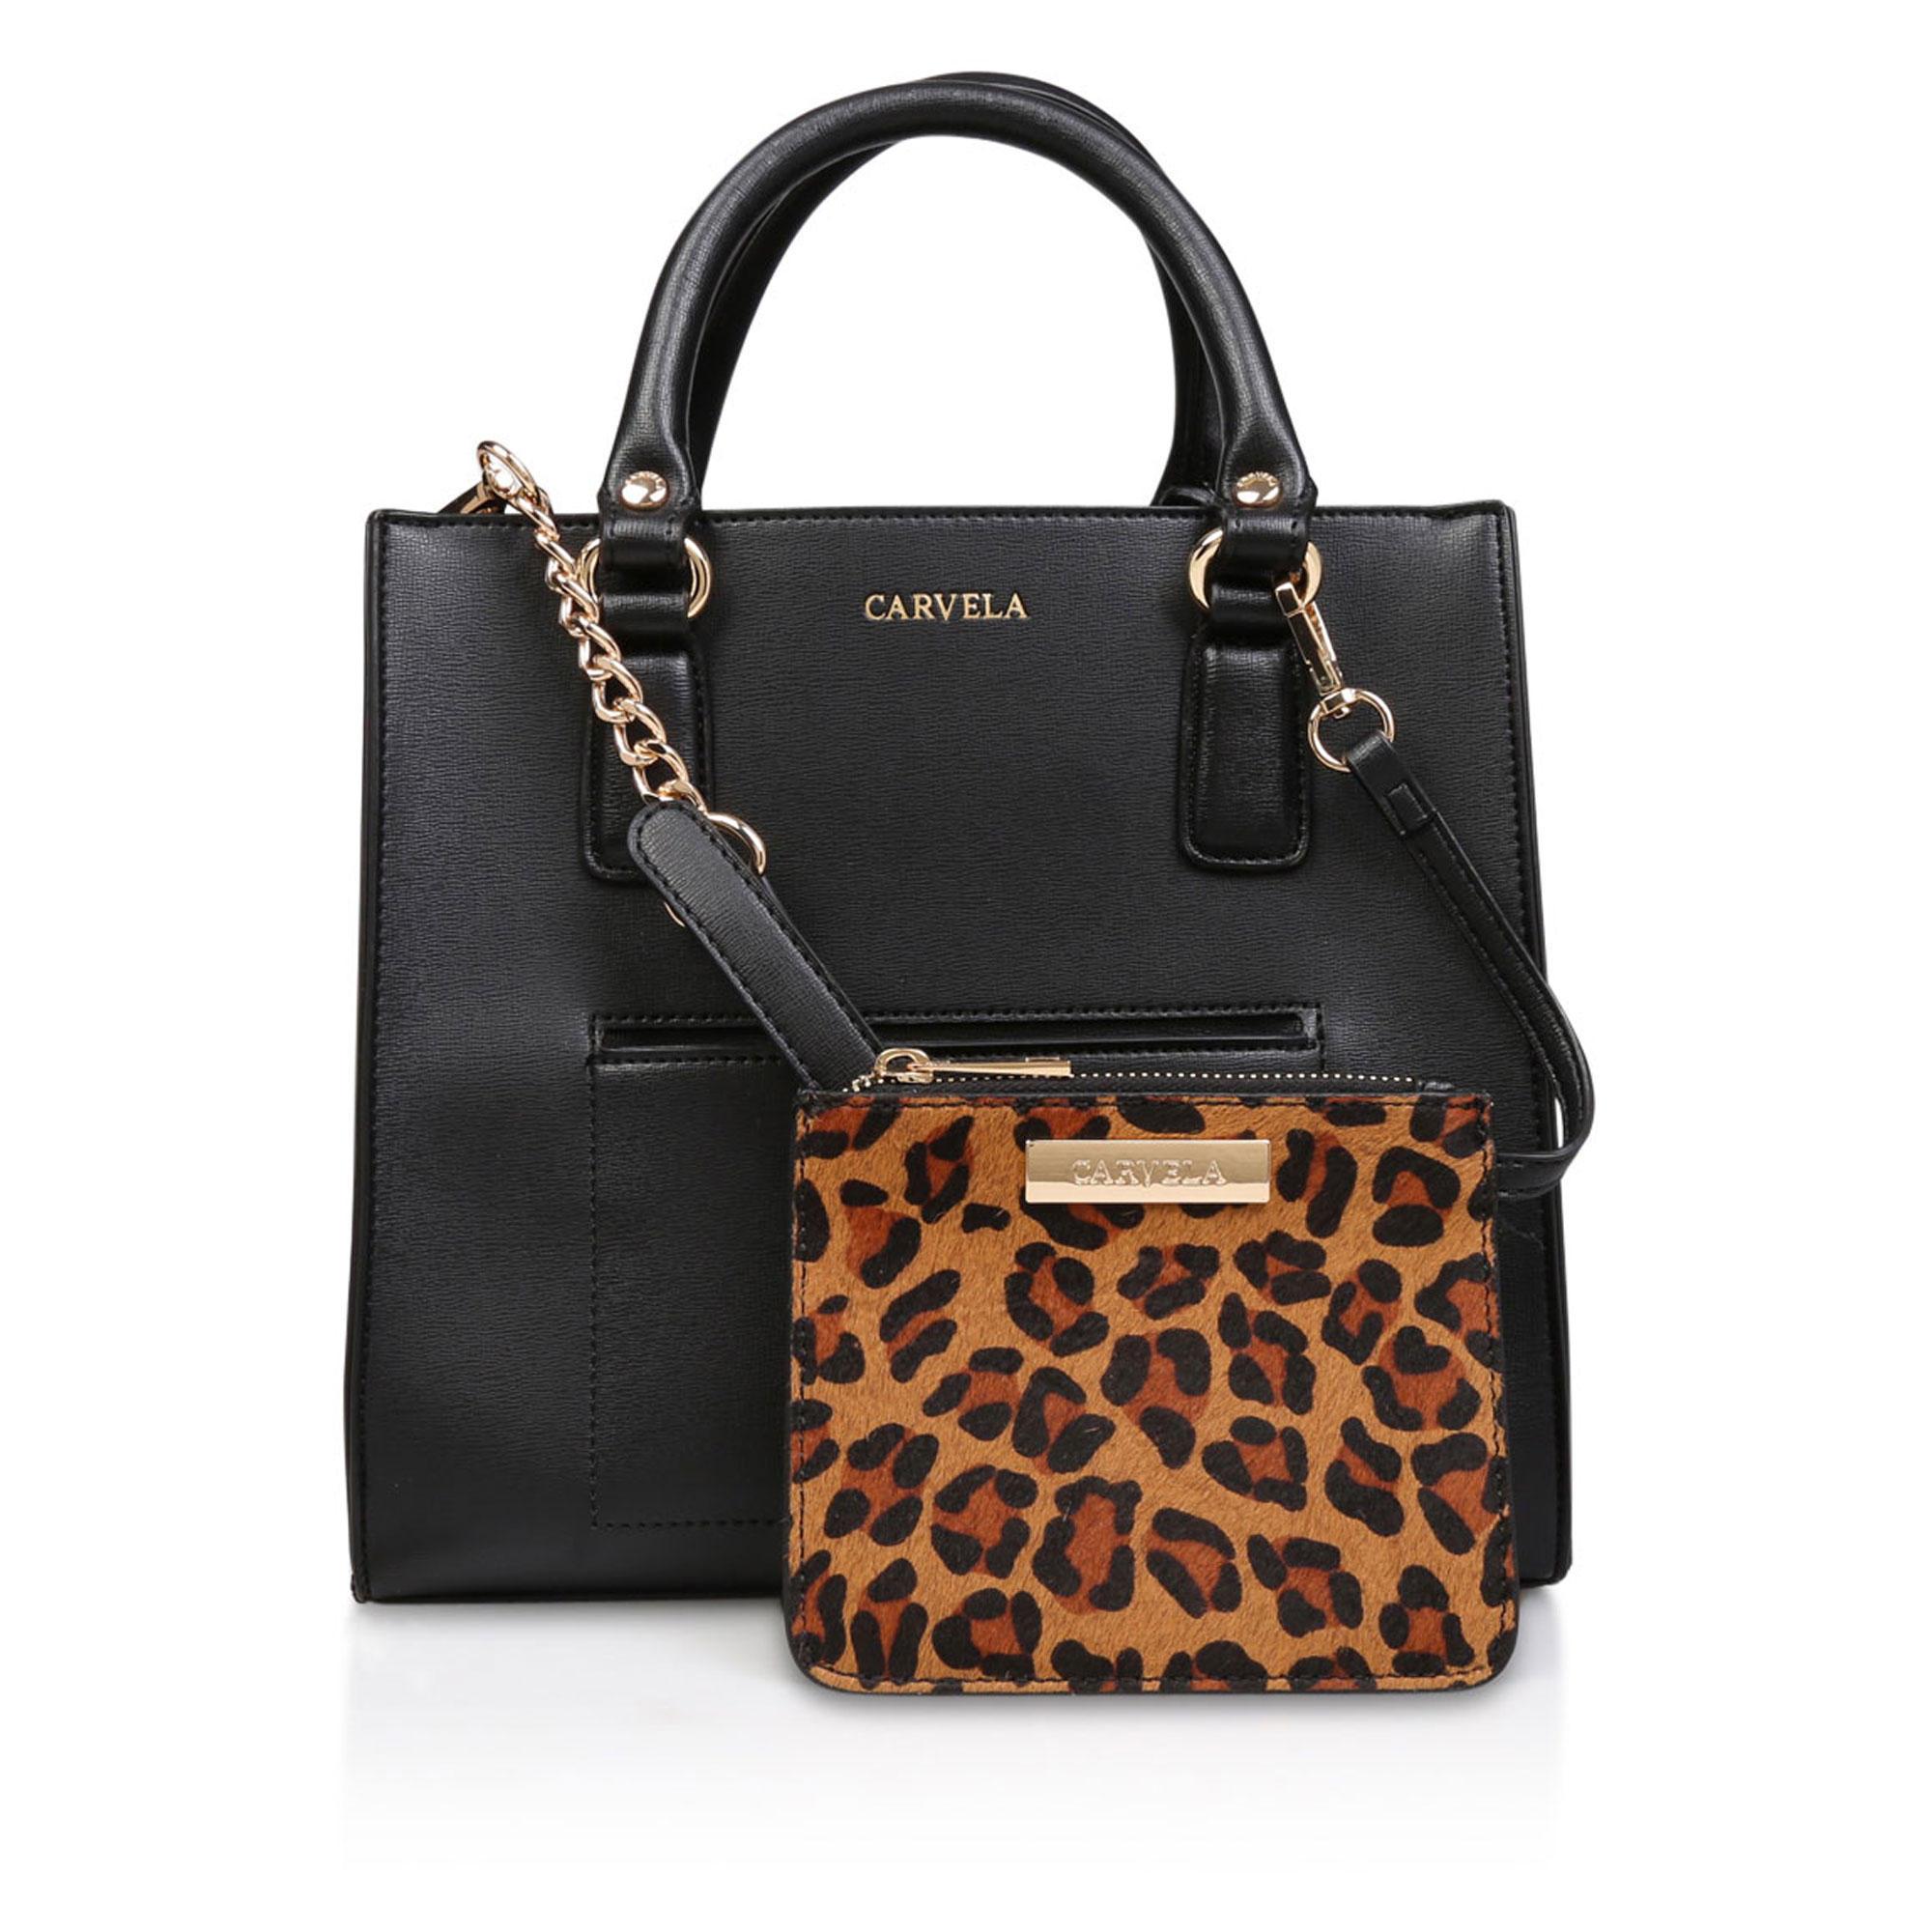 600013502039791600BLACK: Simba Pocket Purse Tote Bag